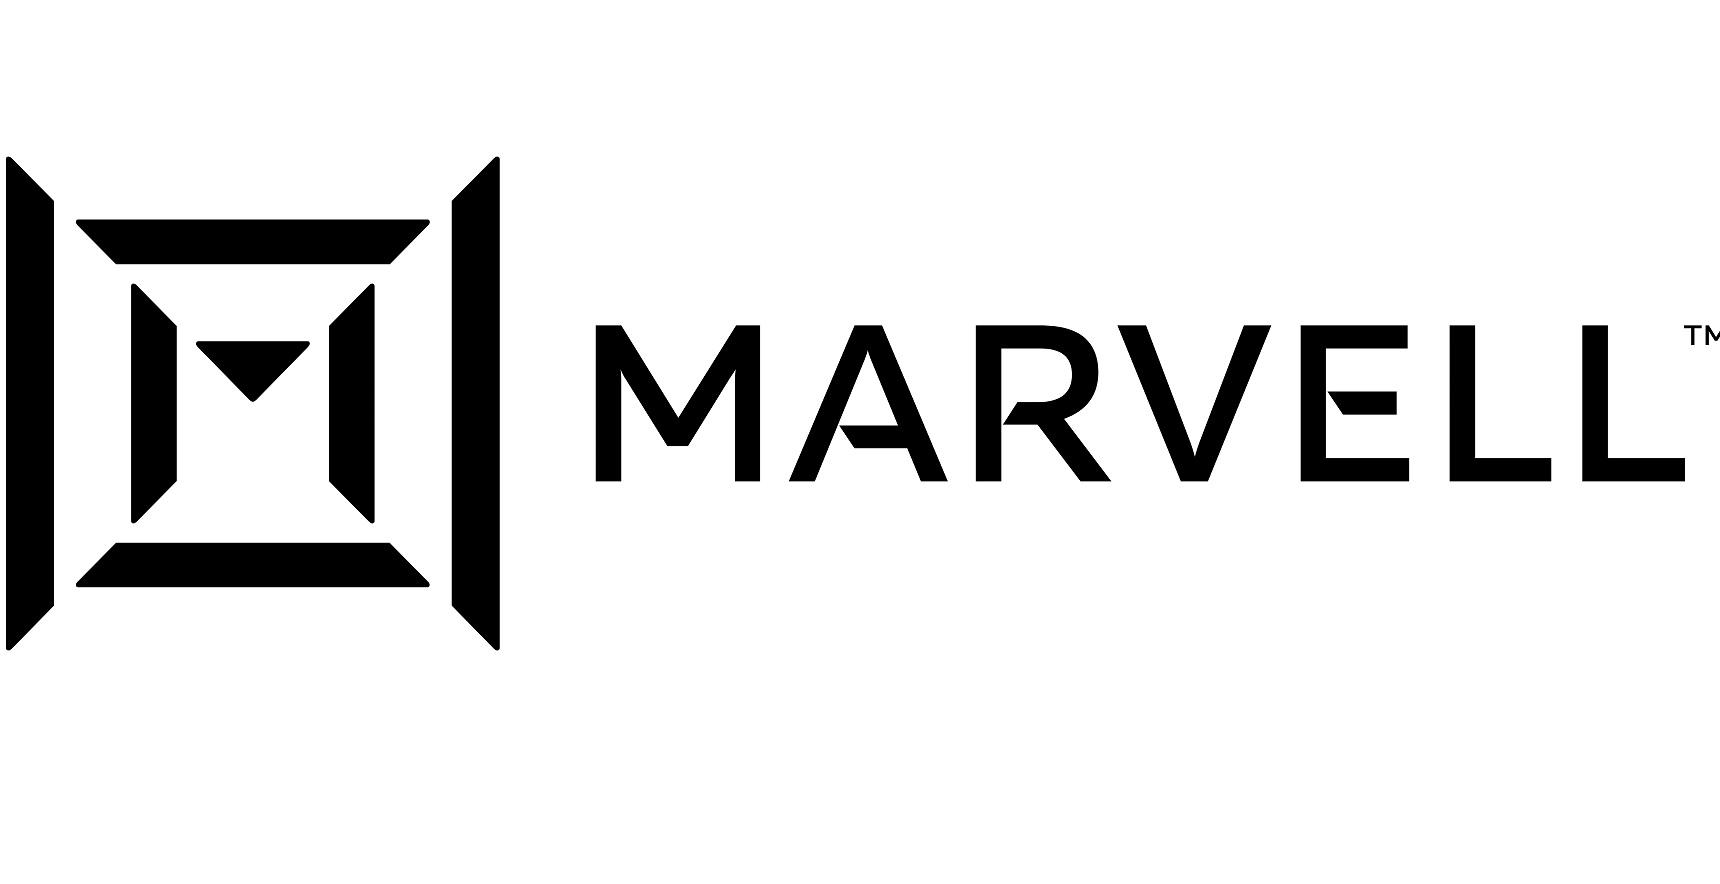 MARVEL LOGO לוגו מארוול